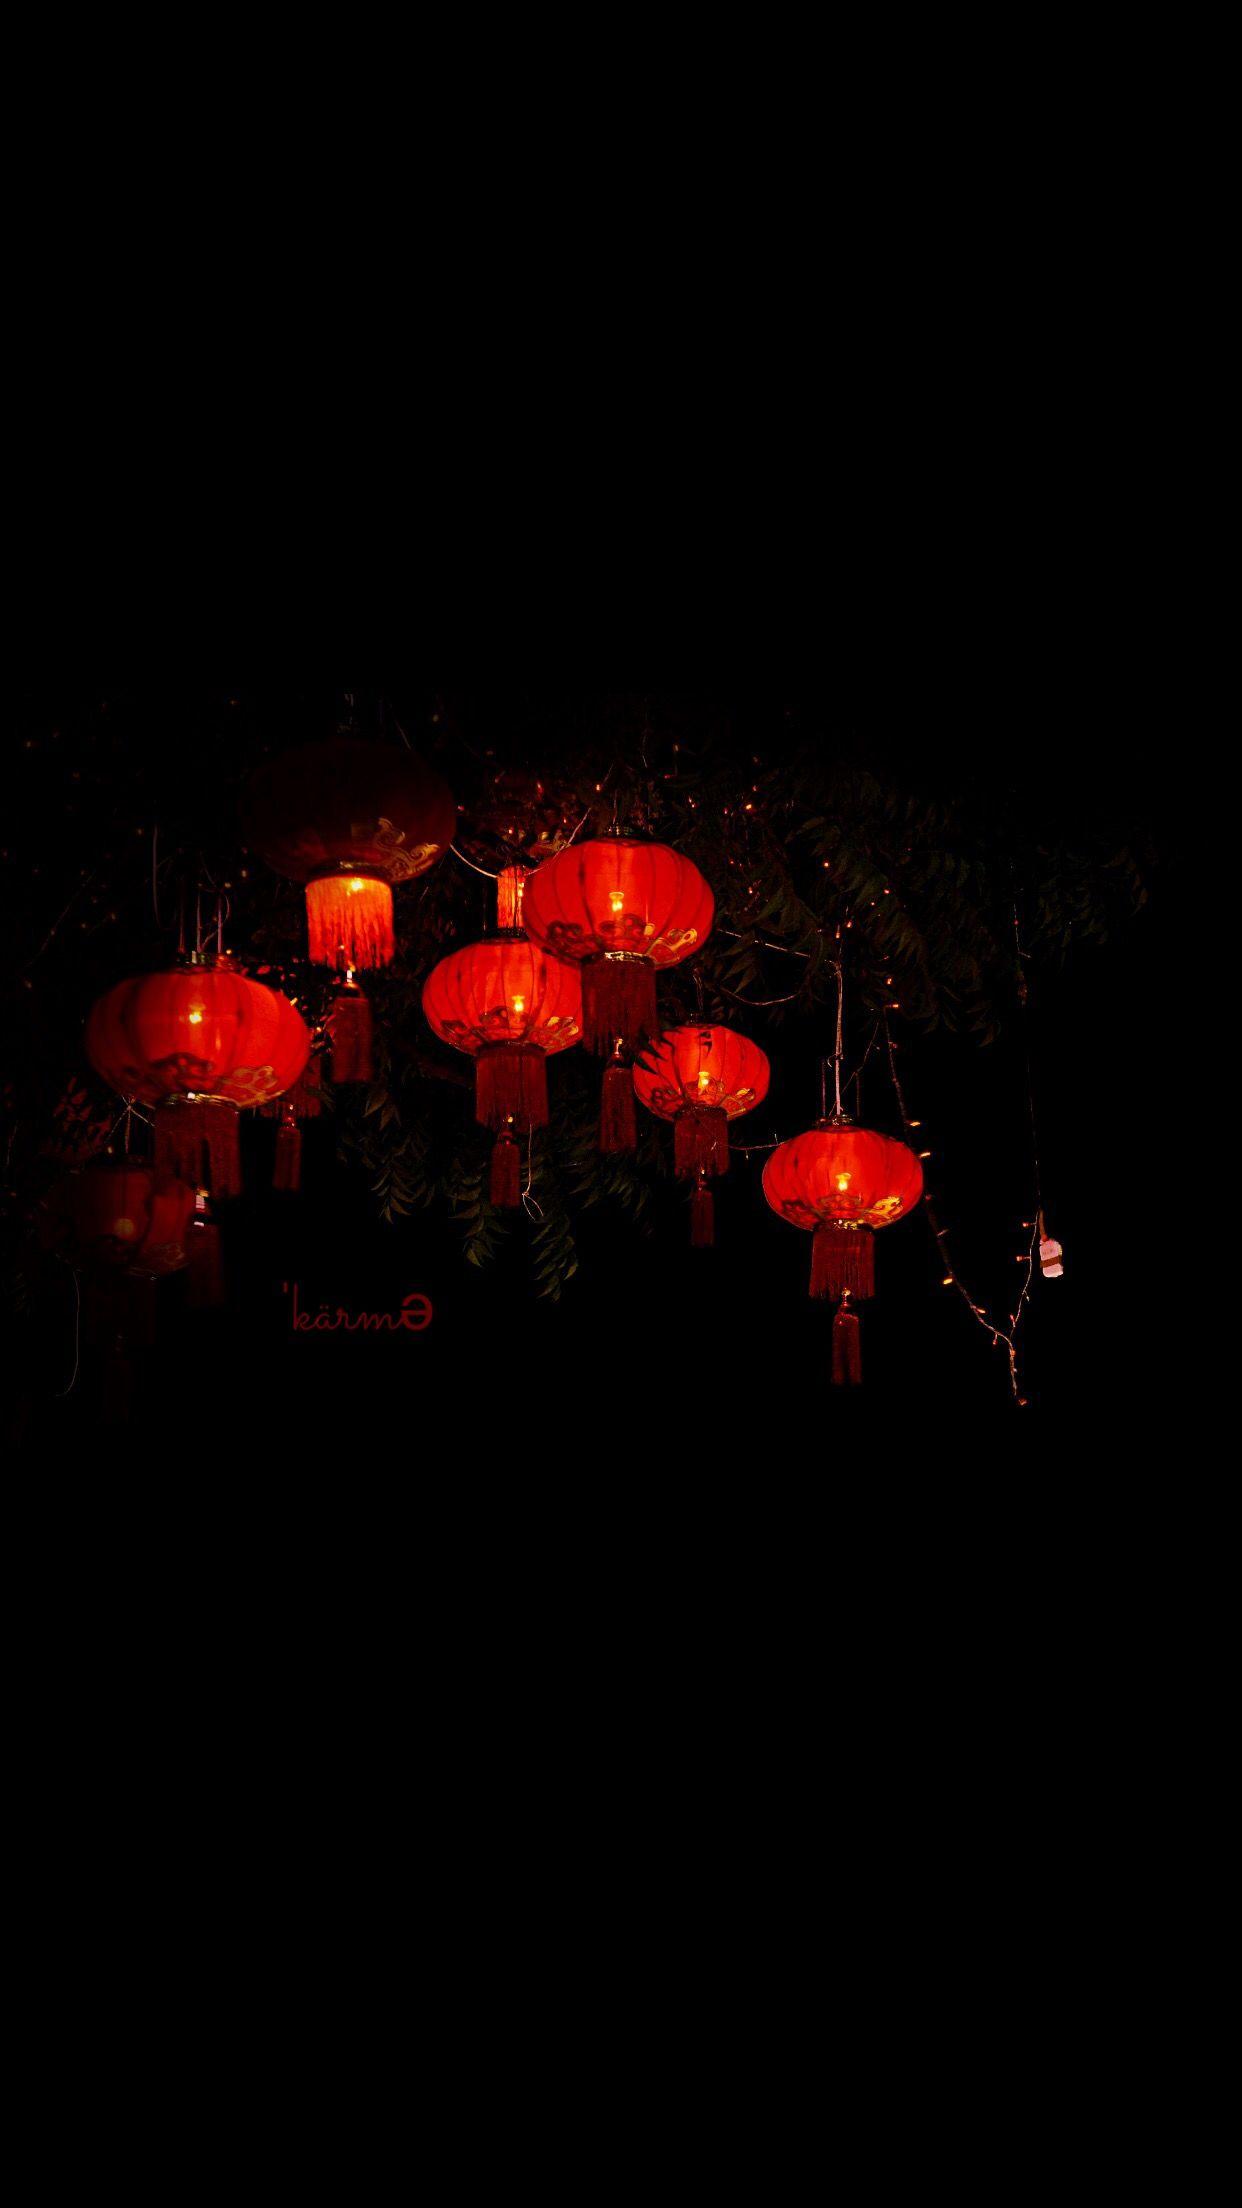 Red Lanterns Chinese Karma Logo Apple Wallpaper Iphone Clean Black Ios Minimal Iphone 7 Iphone 6 Iph Chinese Wallpaper Iphone Wallpaper Wallpaper